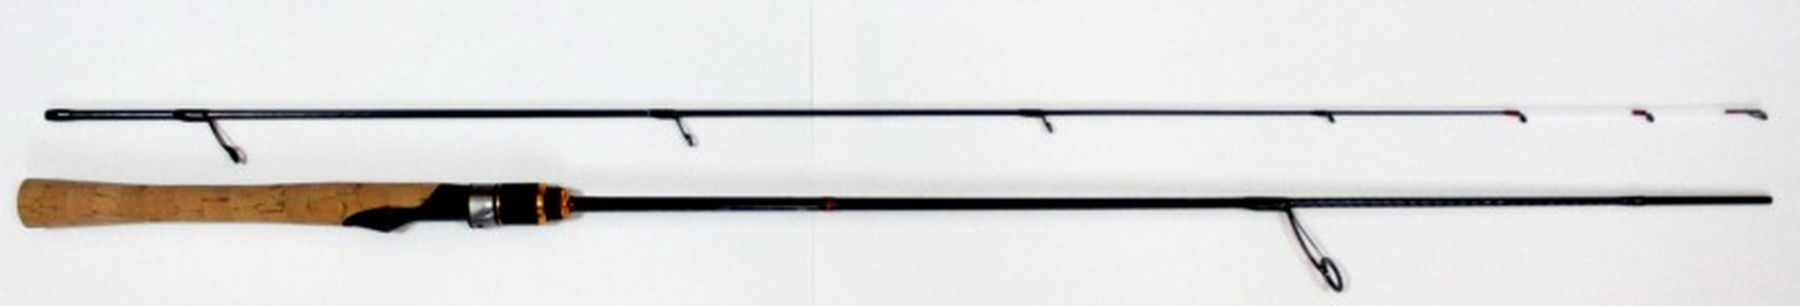 Cпиннинг Mifine Camara Jig Spin 2.35 м / 0.5-8г / арт 11317-235